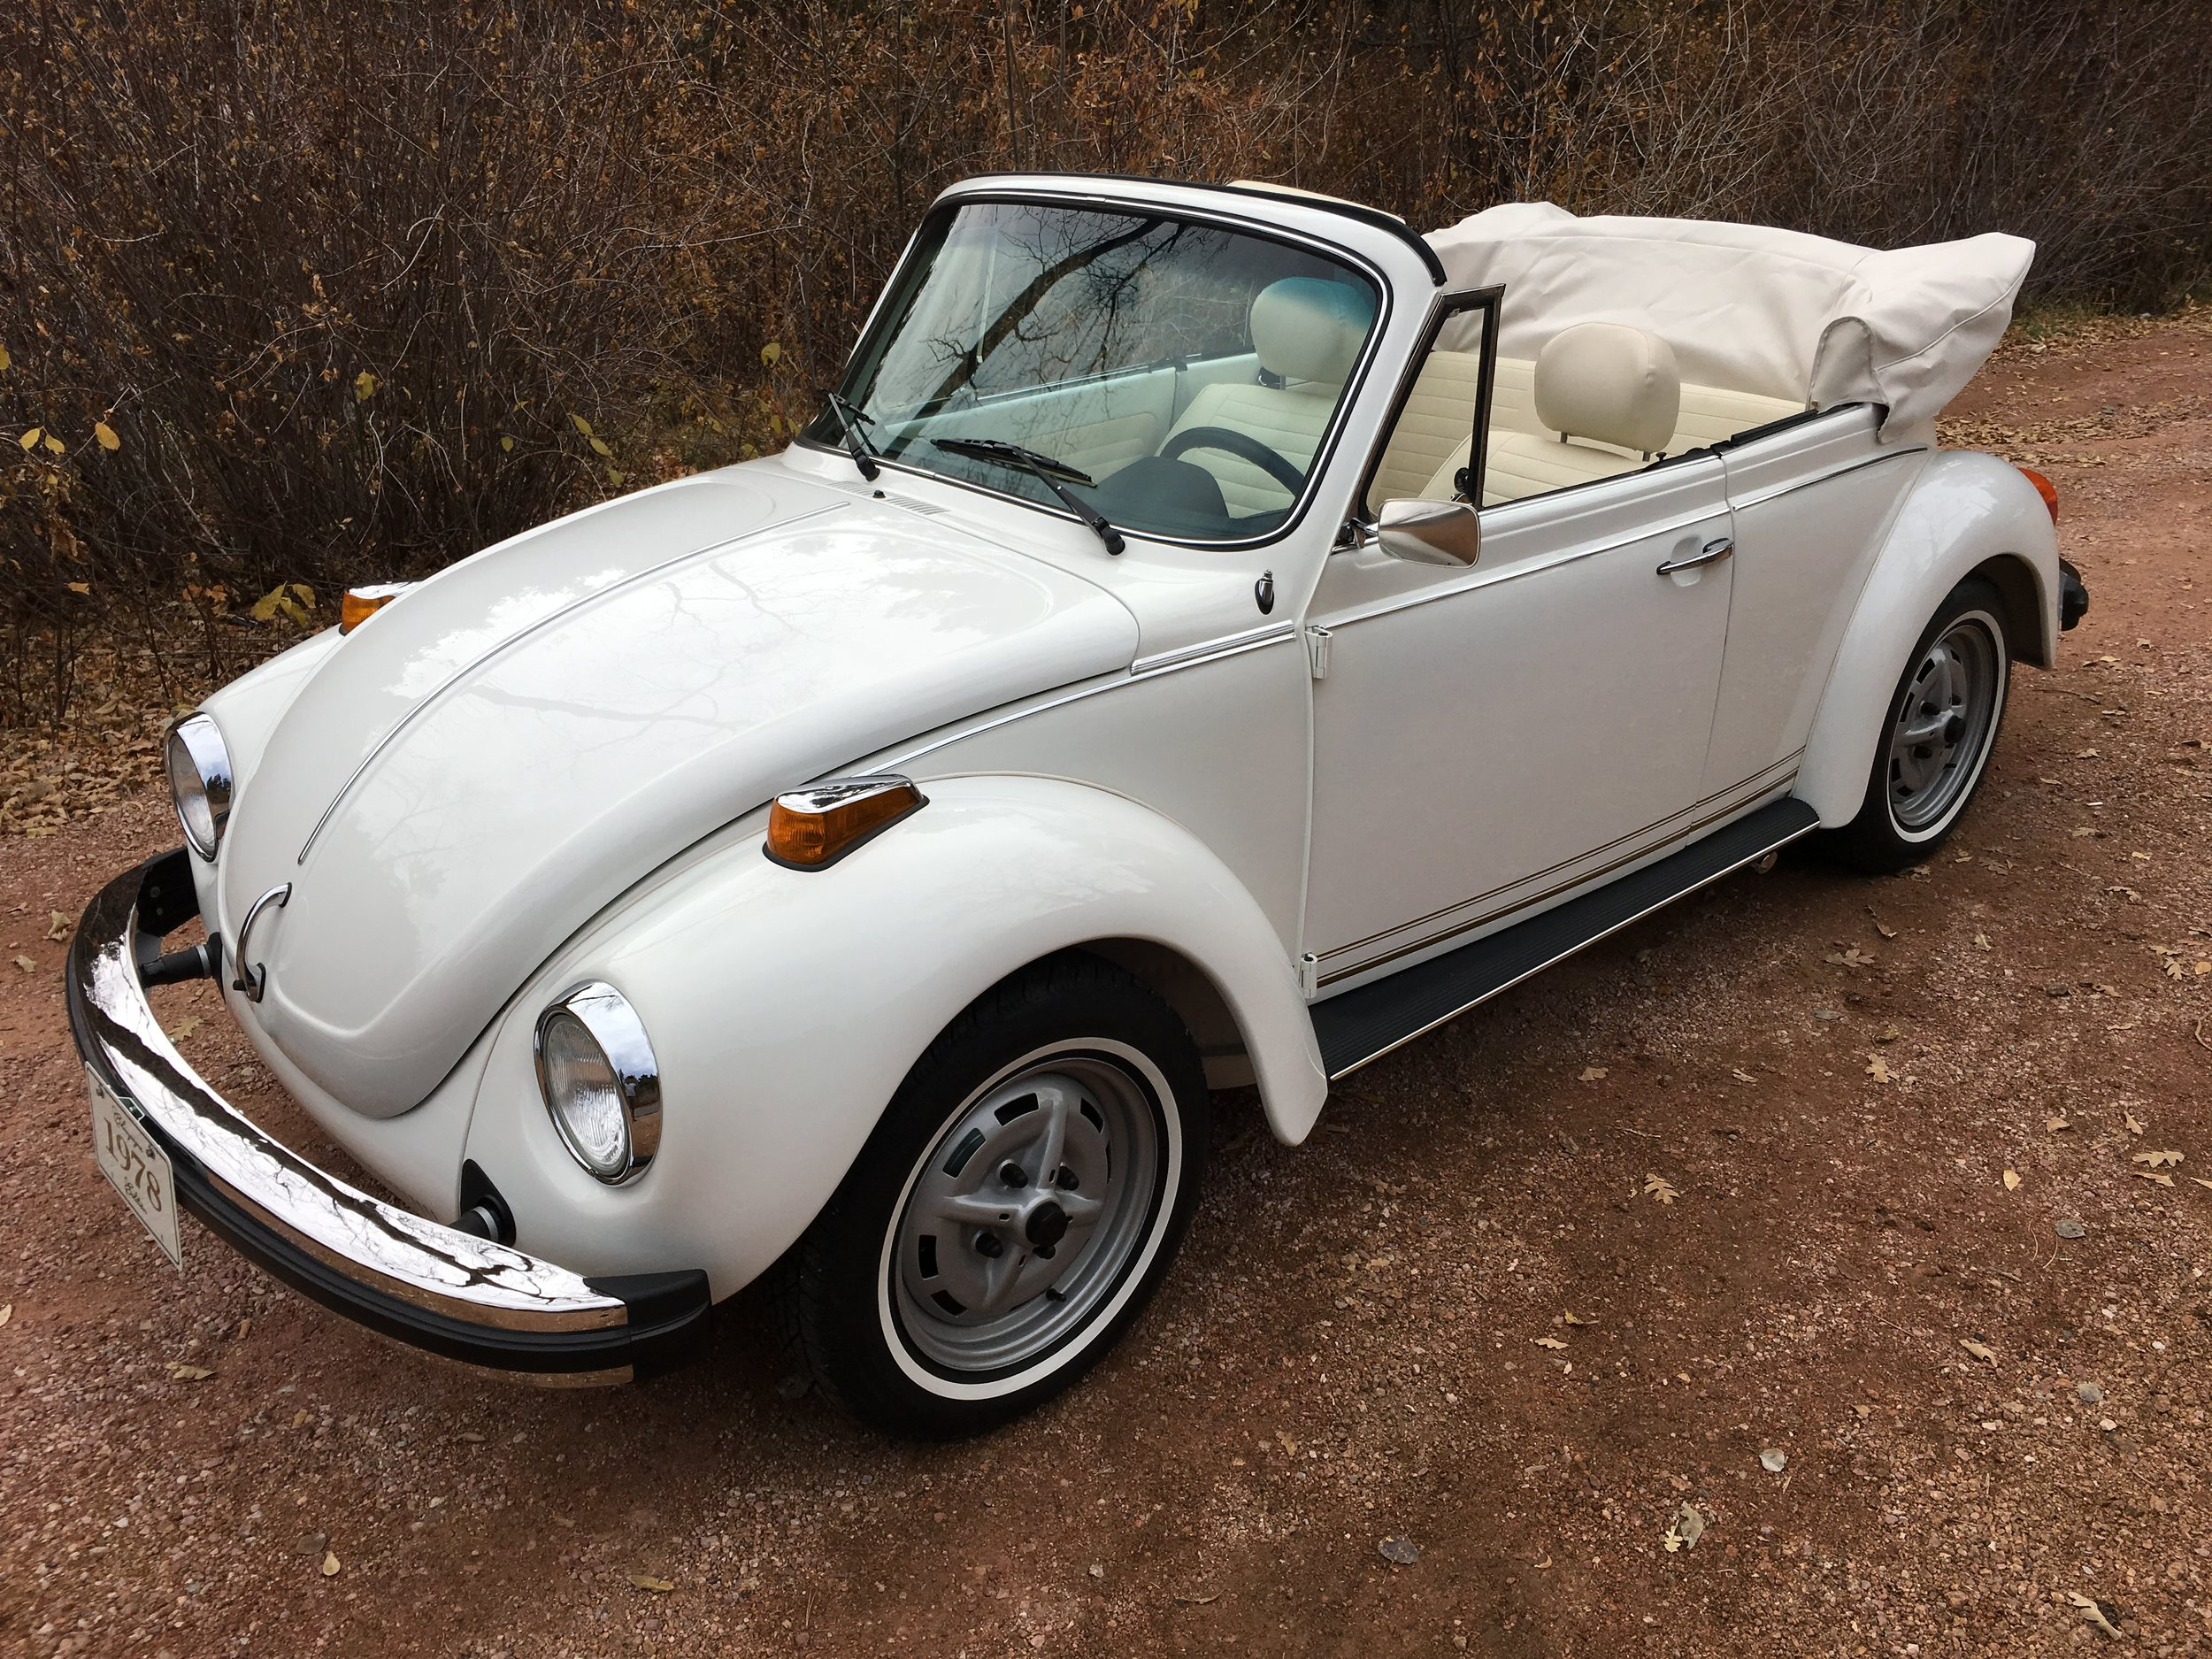 1978 Convertible Super Beetle (2018)